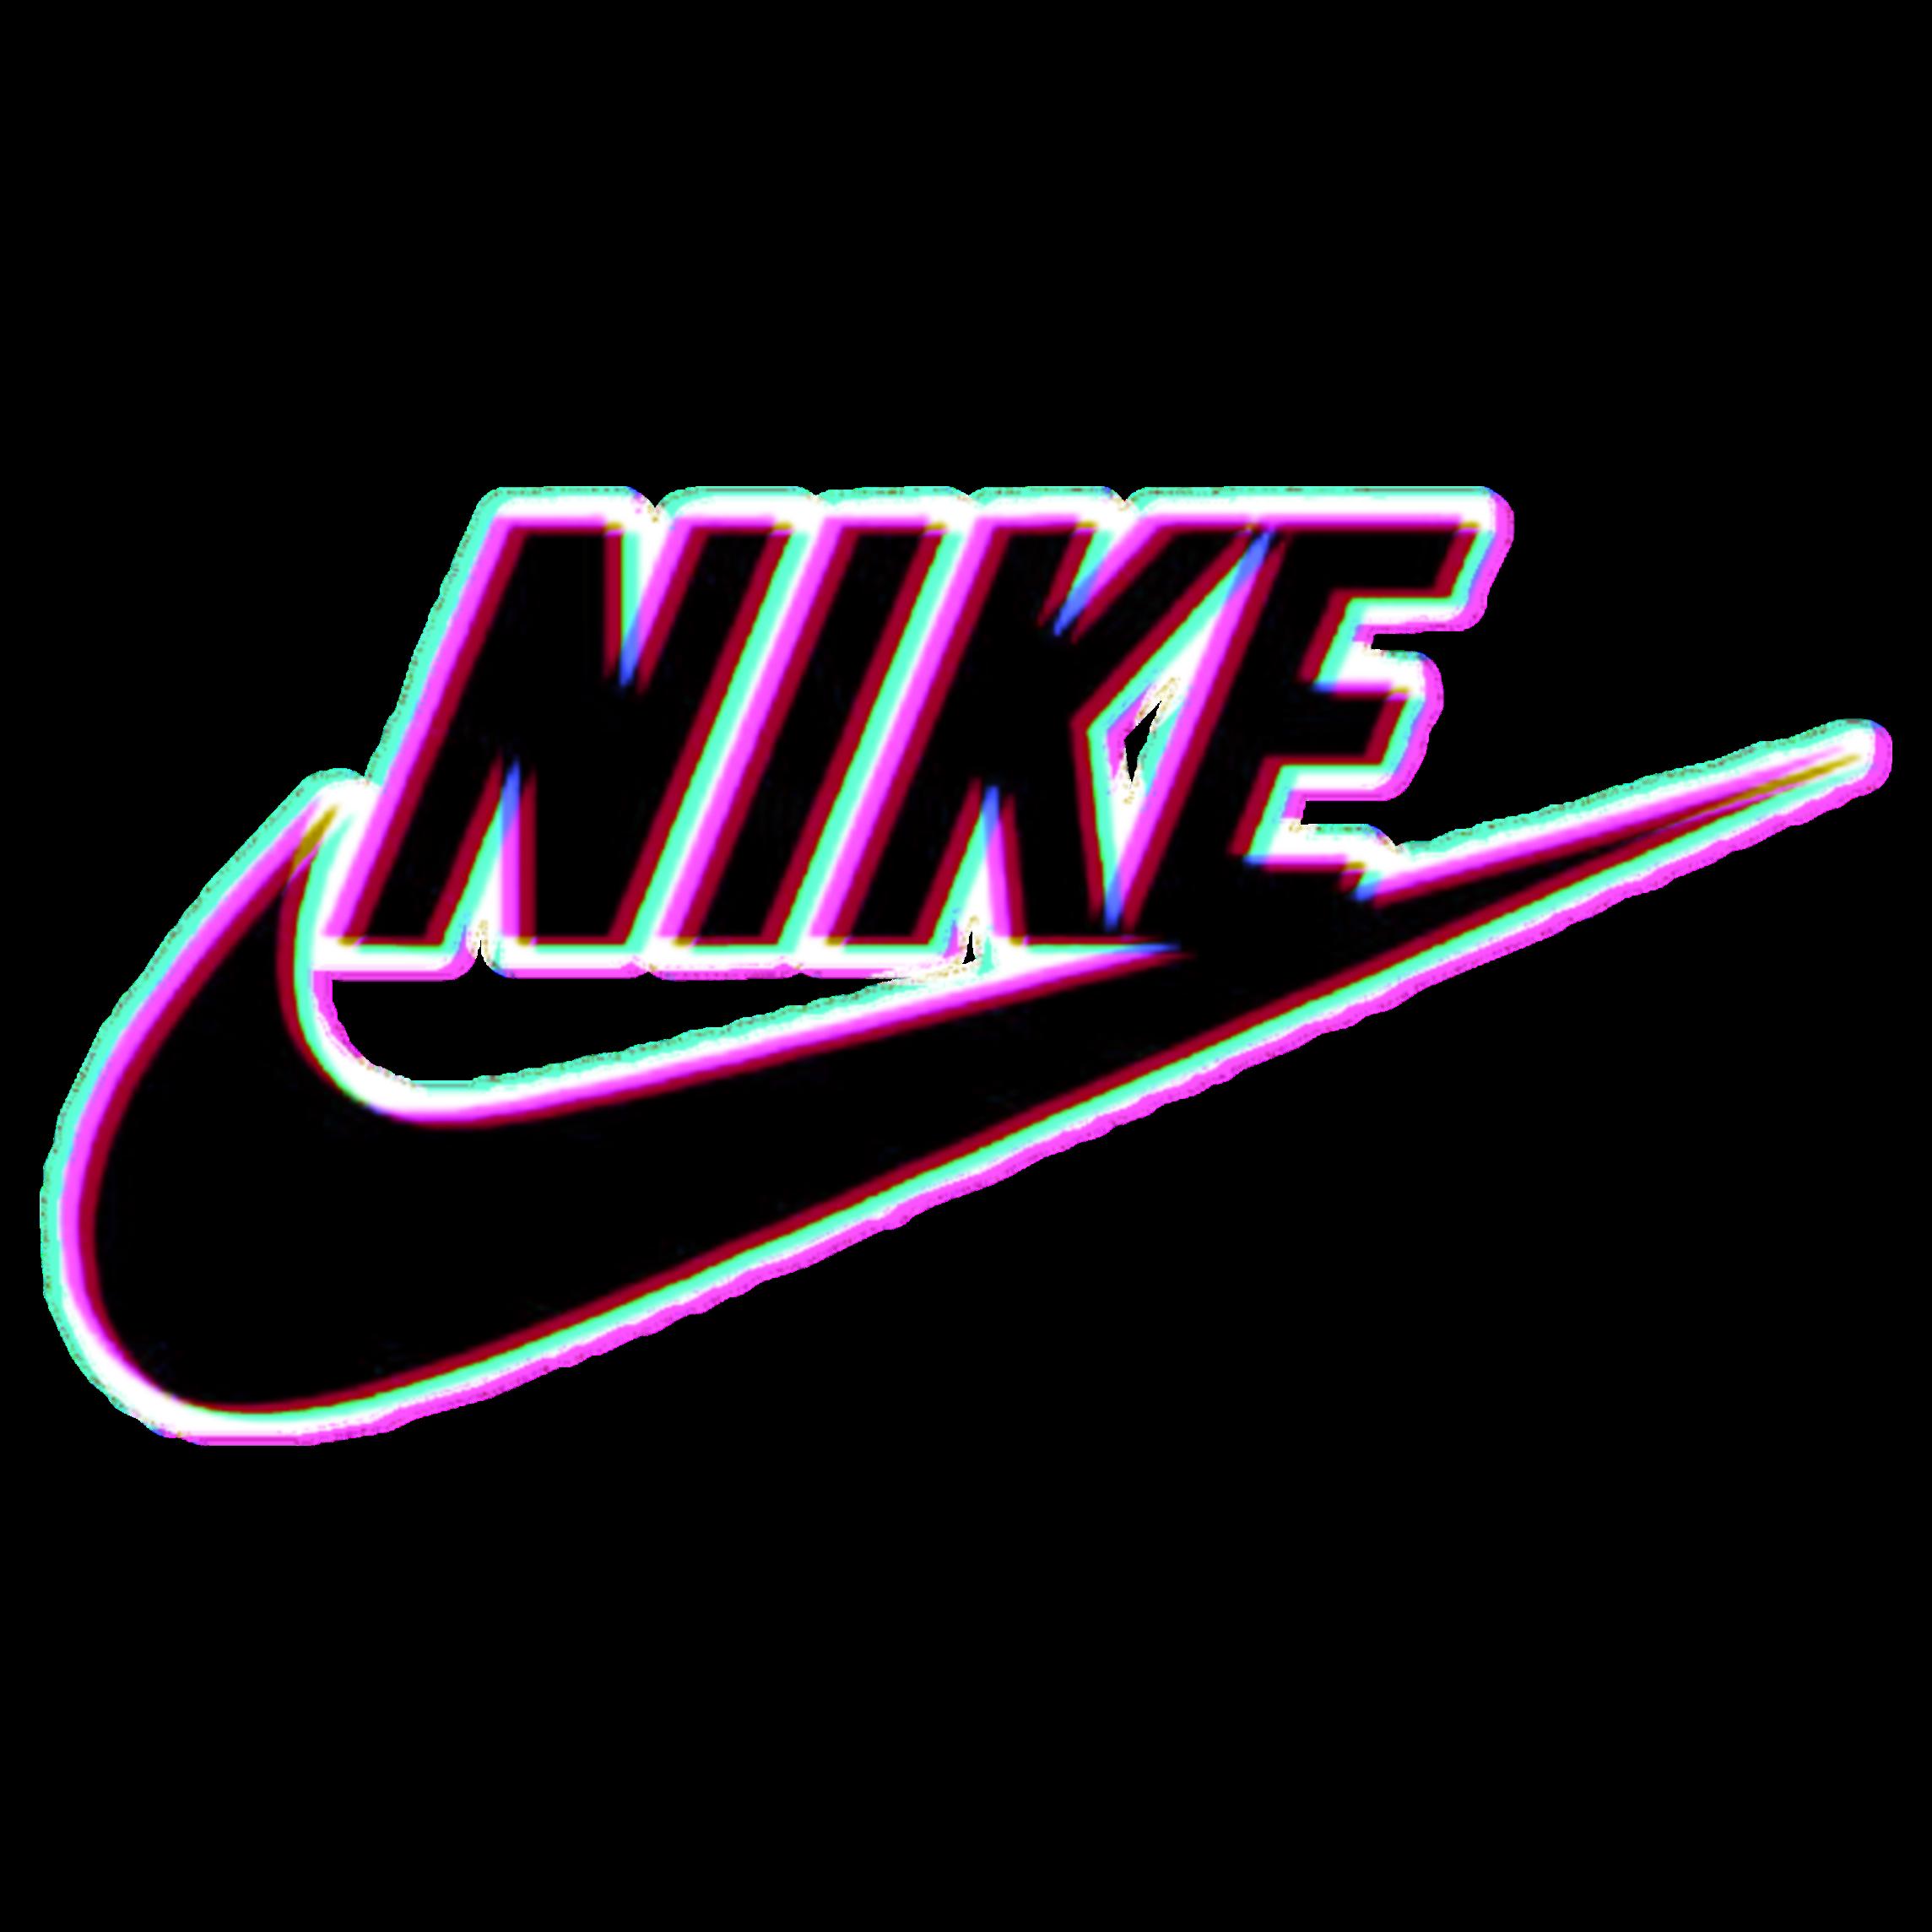 nike black clothes glitch text tumblr 3d logo